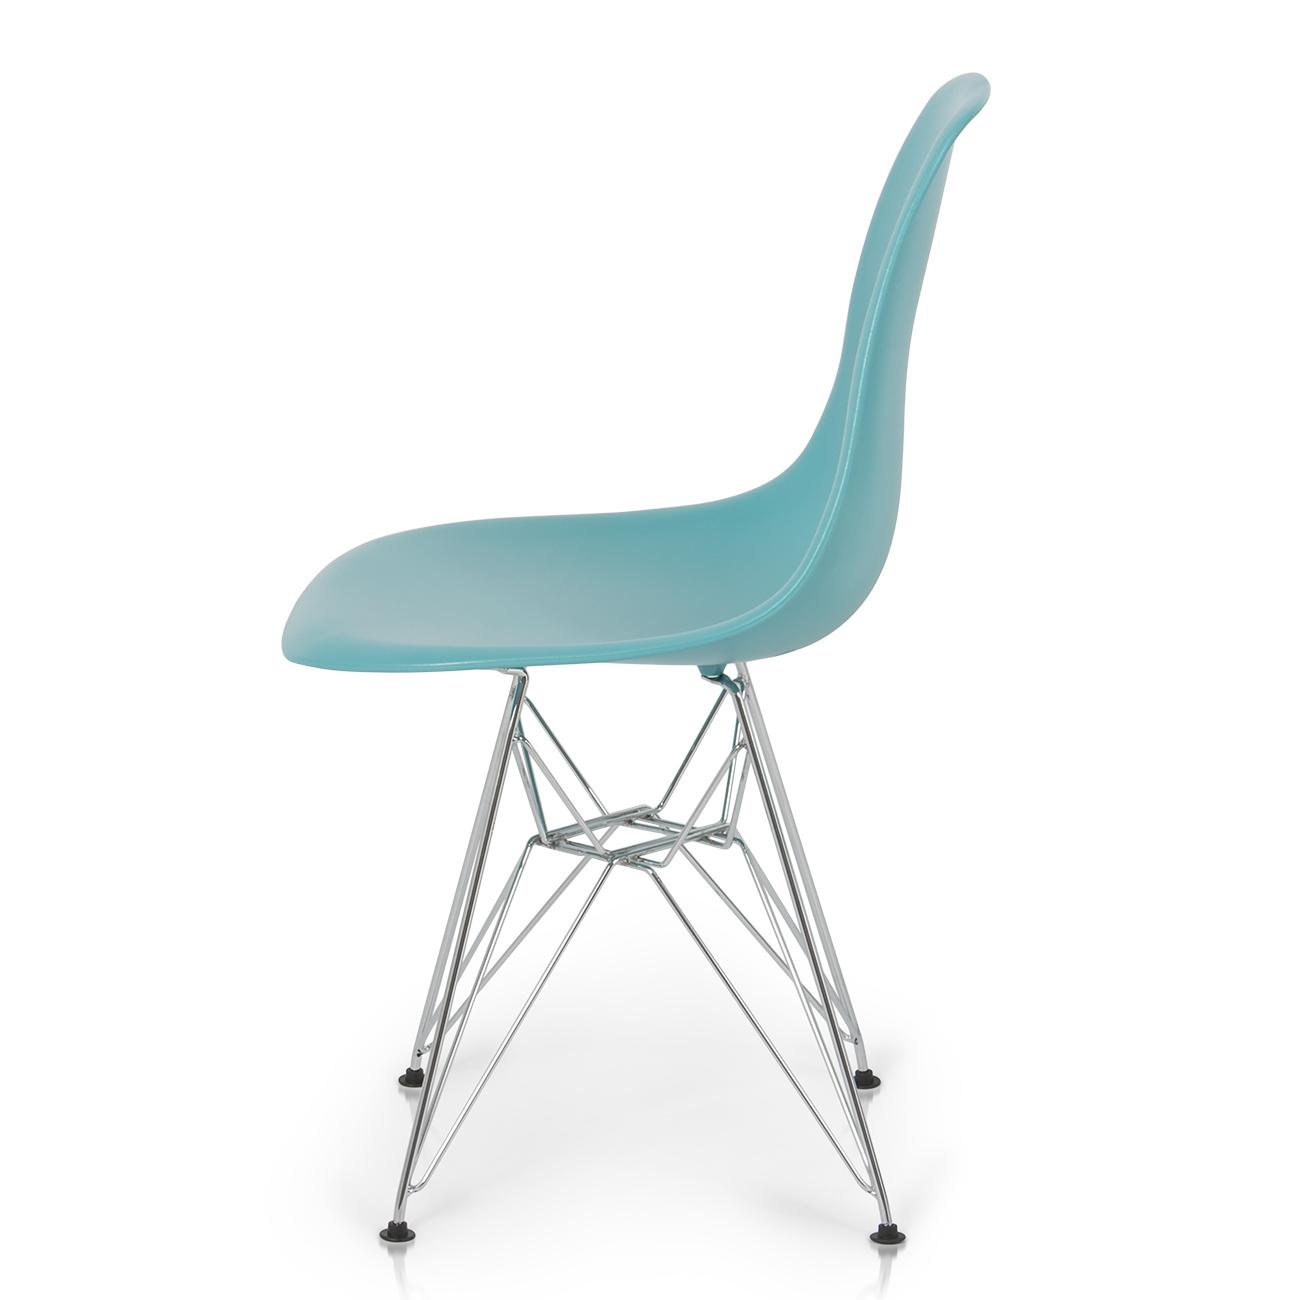 2x Eames Style DSW Modern Eiffel Side Chair Molded ABS